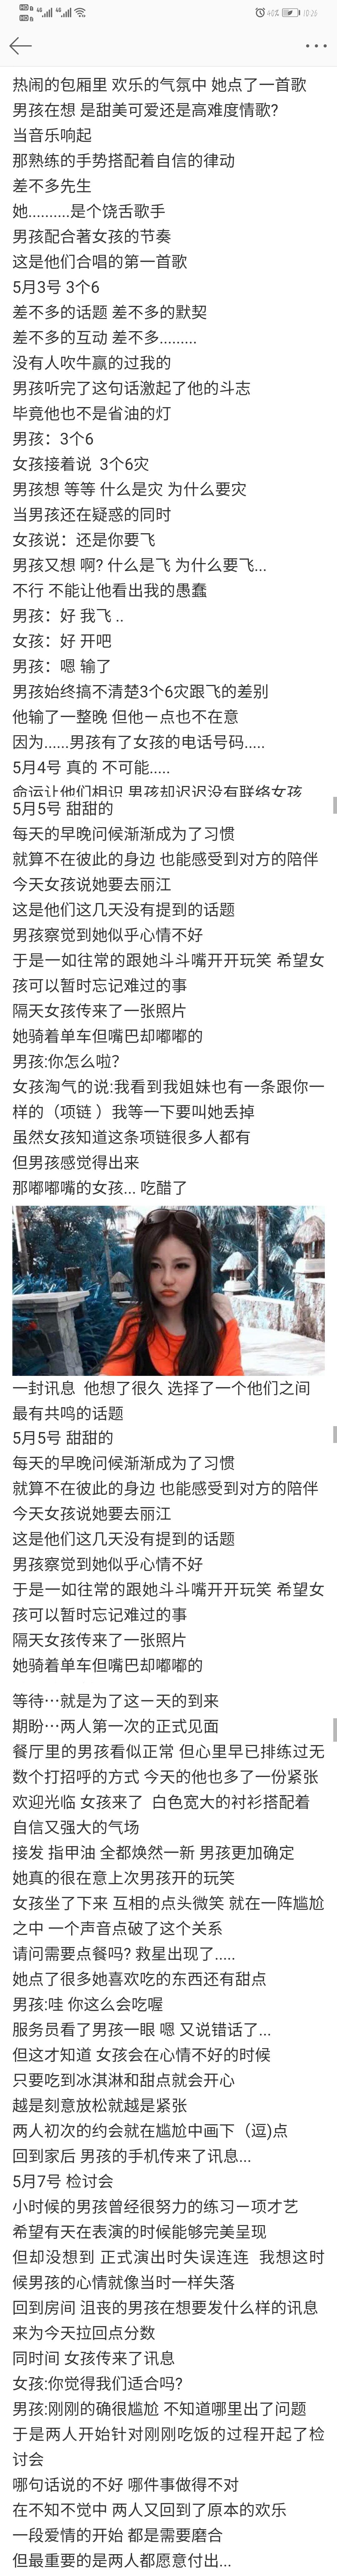 Screenshot_20200520_102626_com.sina.weibo_80289222592435.jpg